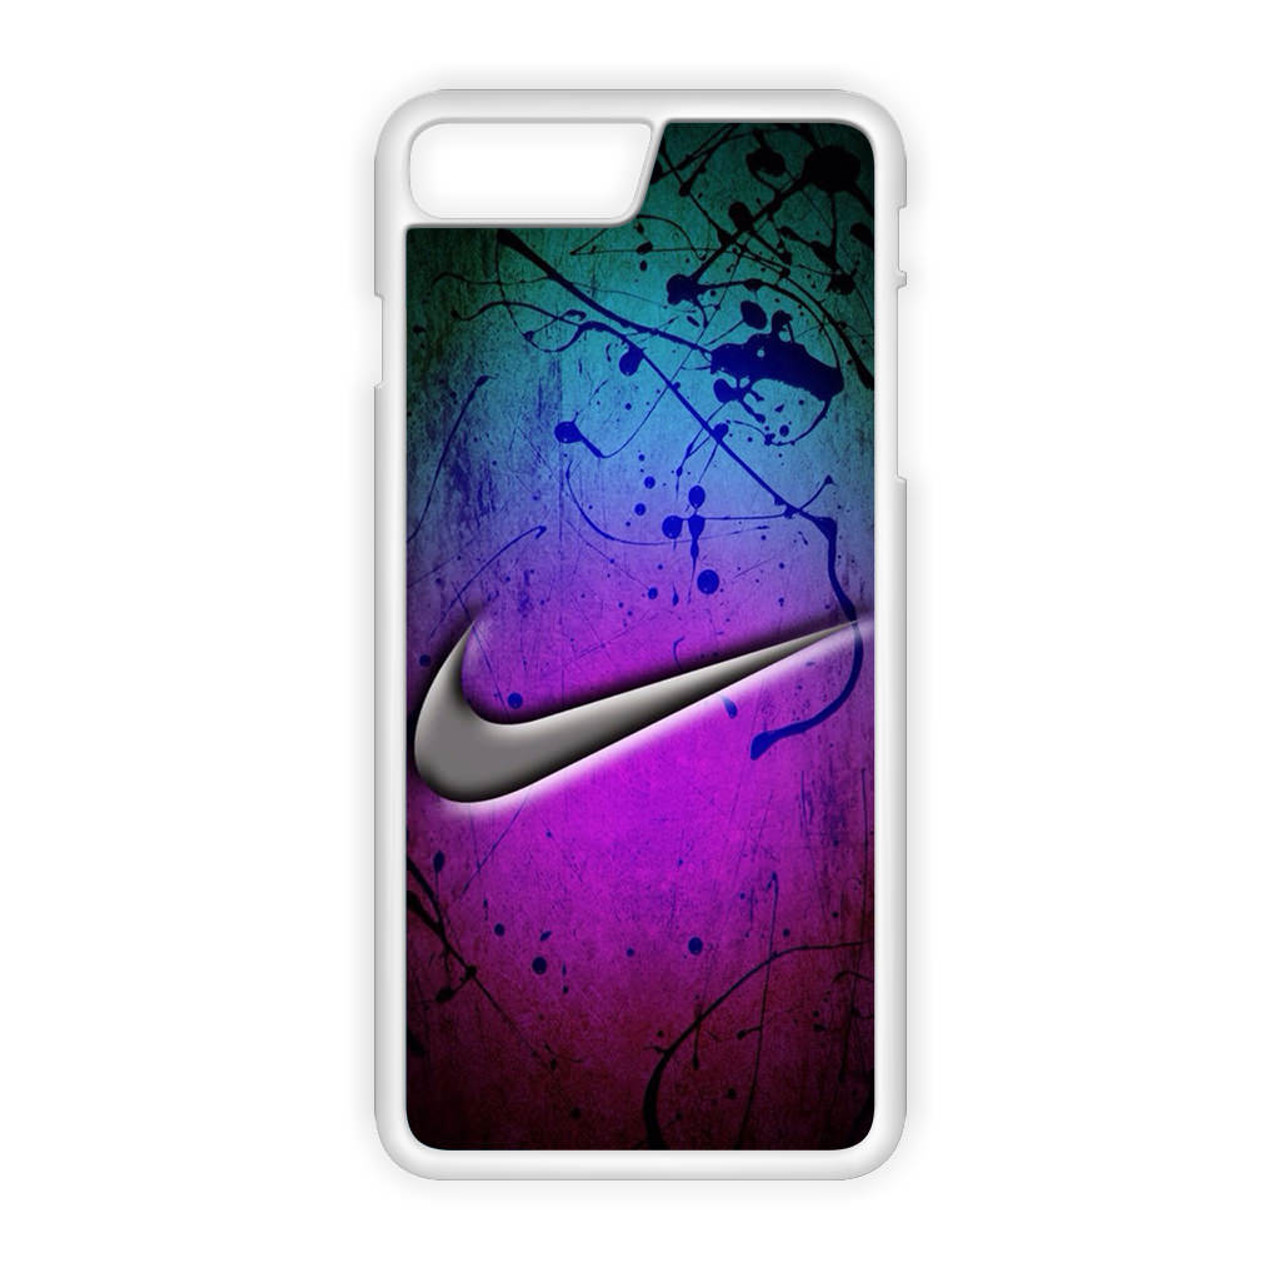 Ejecución Norteamérica Documento  Nike Holographic Style iPhone 7 Plus Case - CASESHUNTER